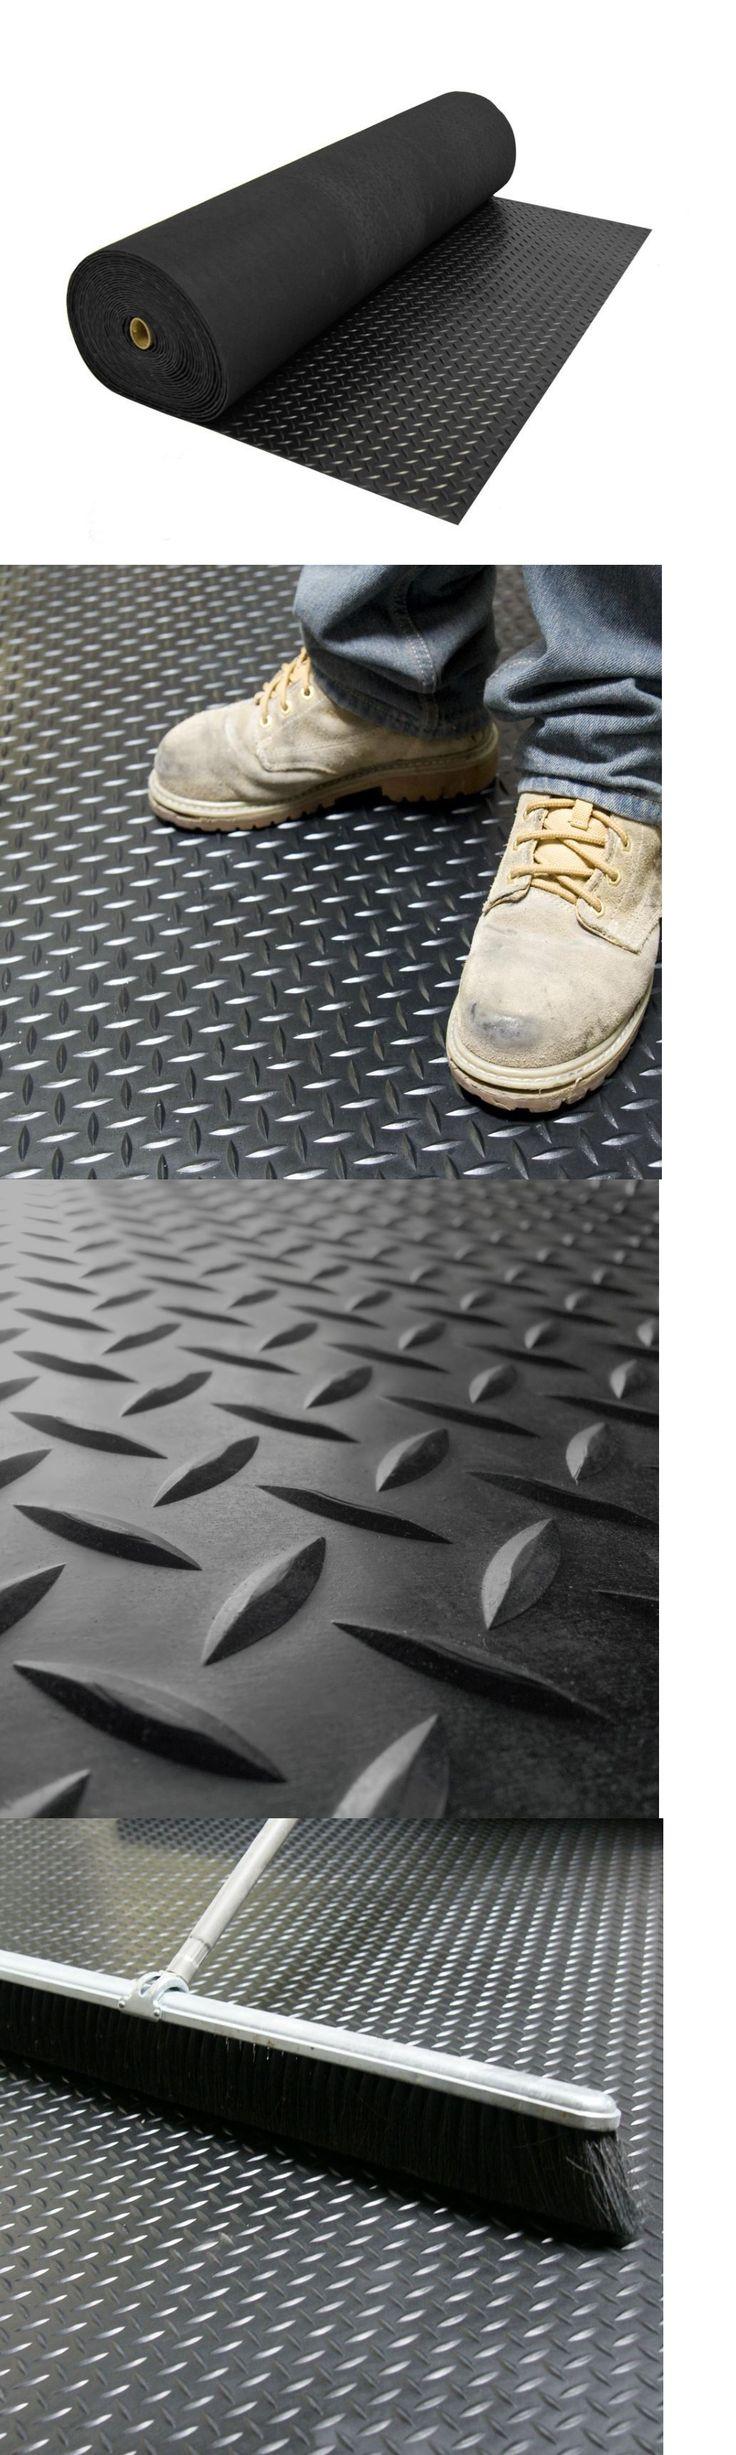 Rubber floor mats denver - 25 Best Ideas About Rubber Garage Flooring On Pinterest Rubber Gym Flooring Home Gyms And Gym Flooring Tiles